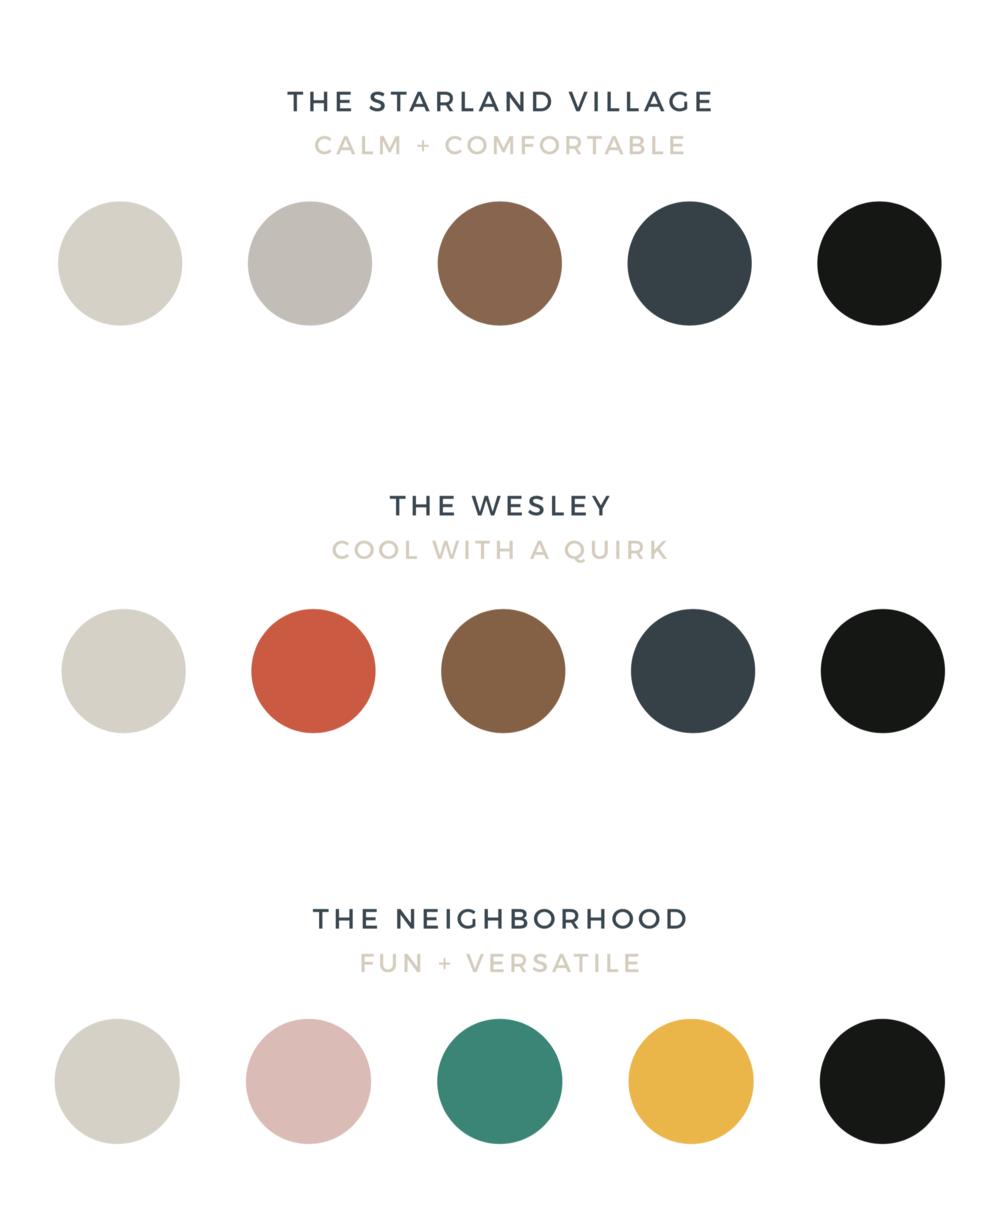 Flourish-Collaborative-Branding-The-Starland-Village-Savannah-Color-Palette1.png